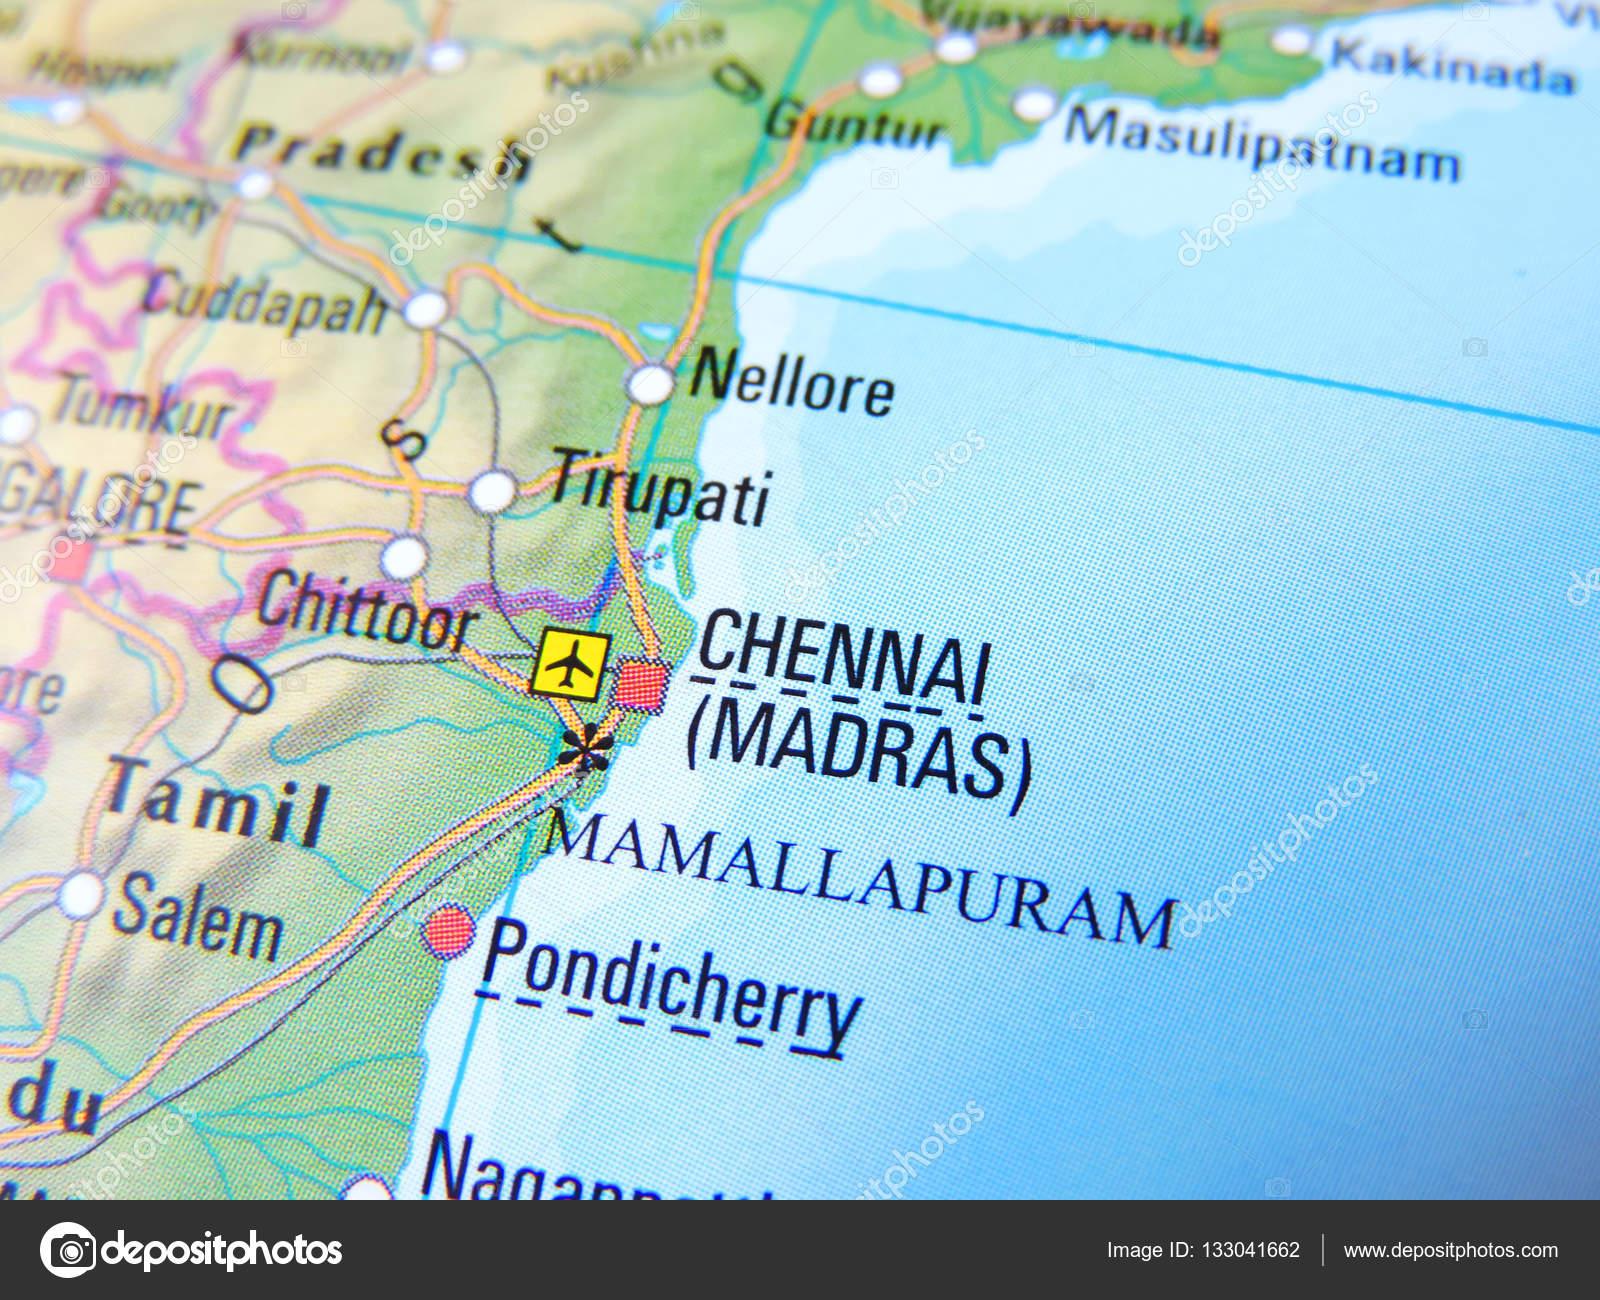 Madras India Map.India With Focus On Madras Stock Photo C Eivaisla 133041662